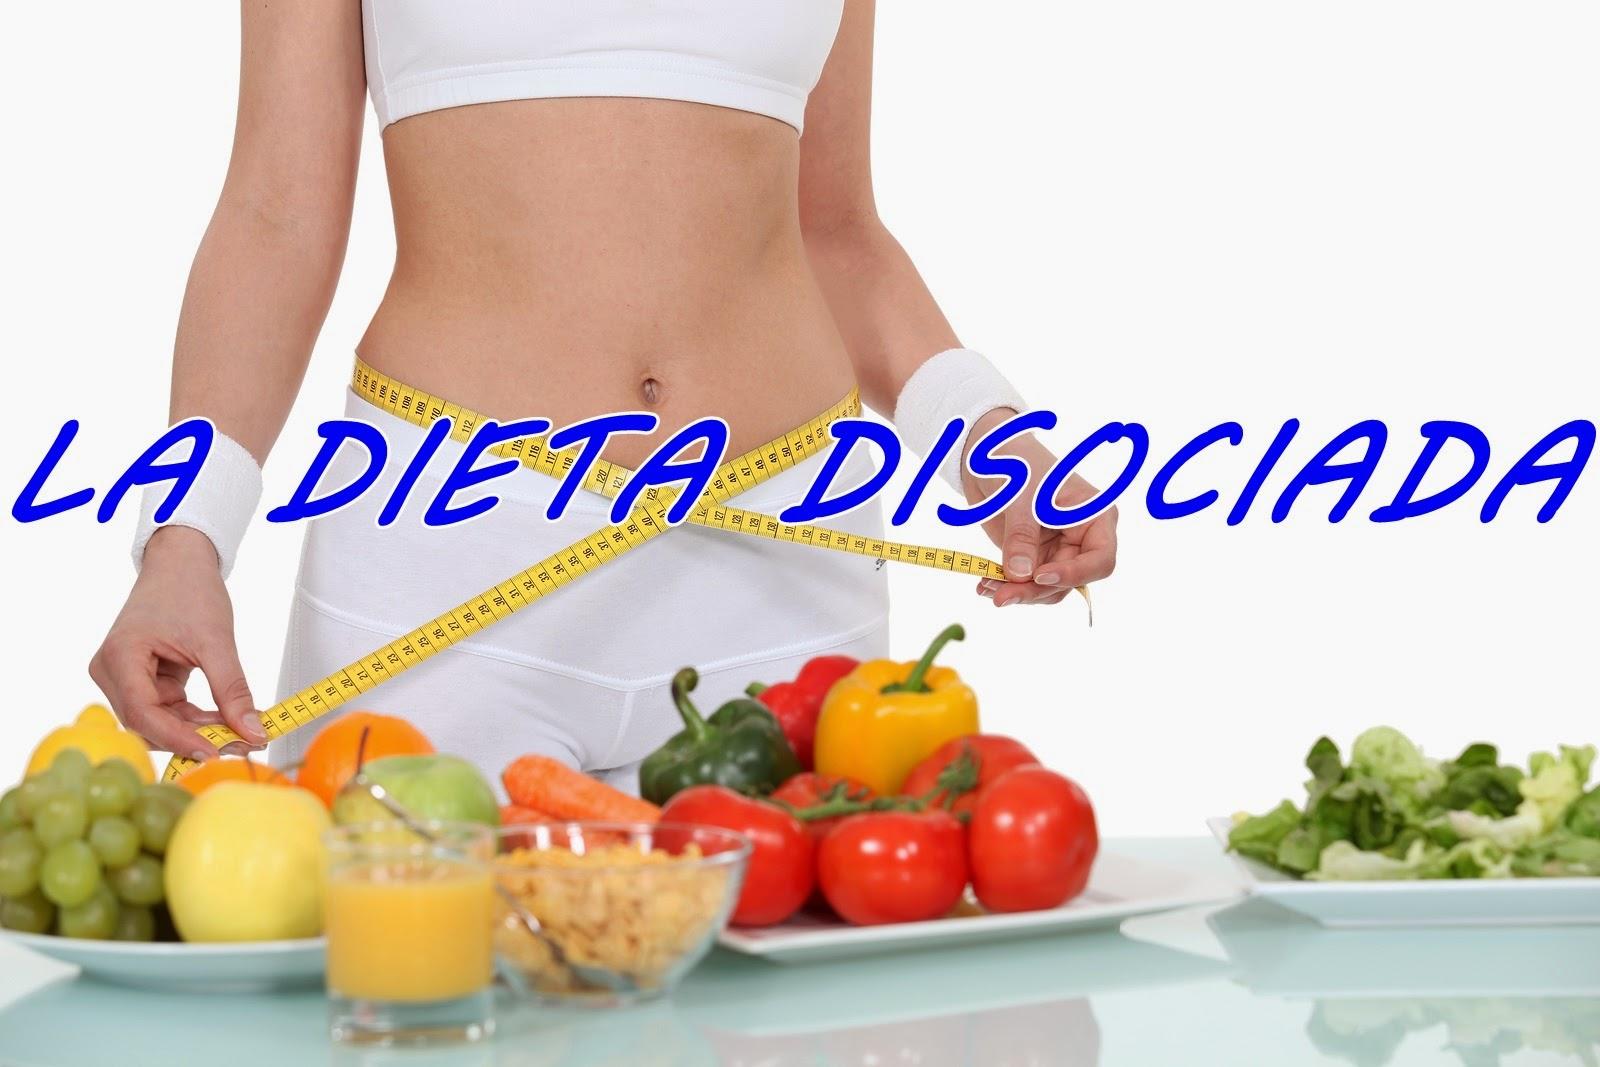 tabla dieta disociada pdf para imprimir gratis